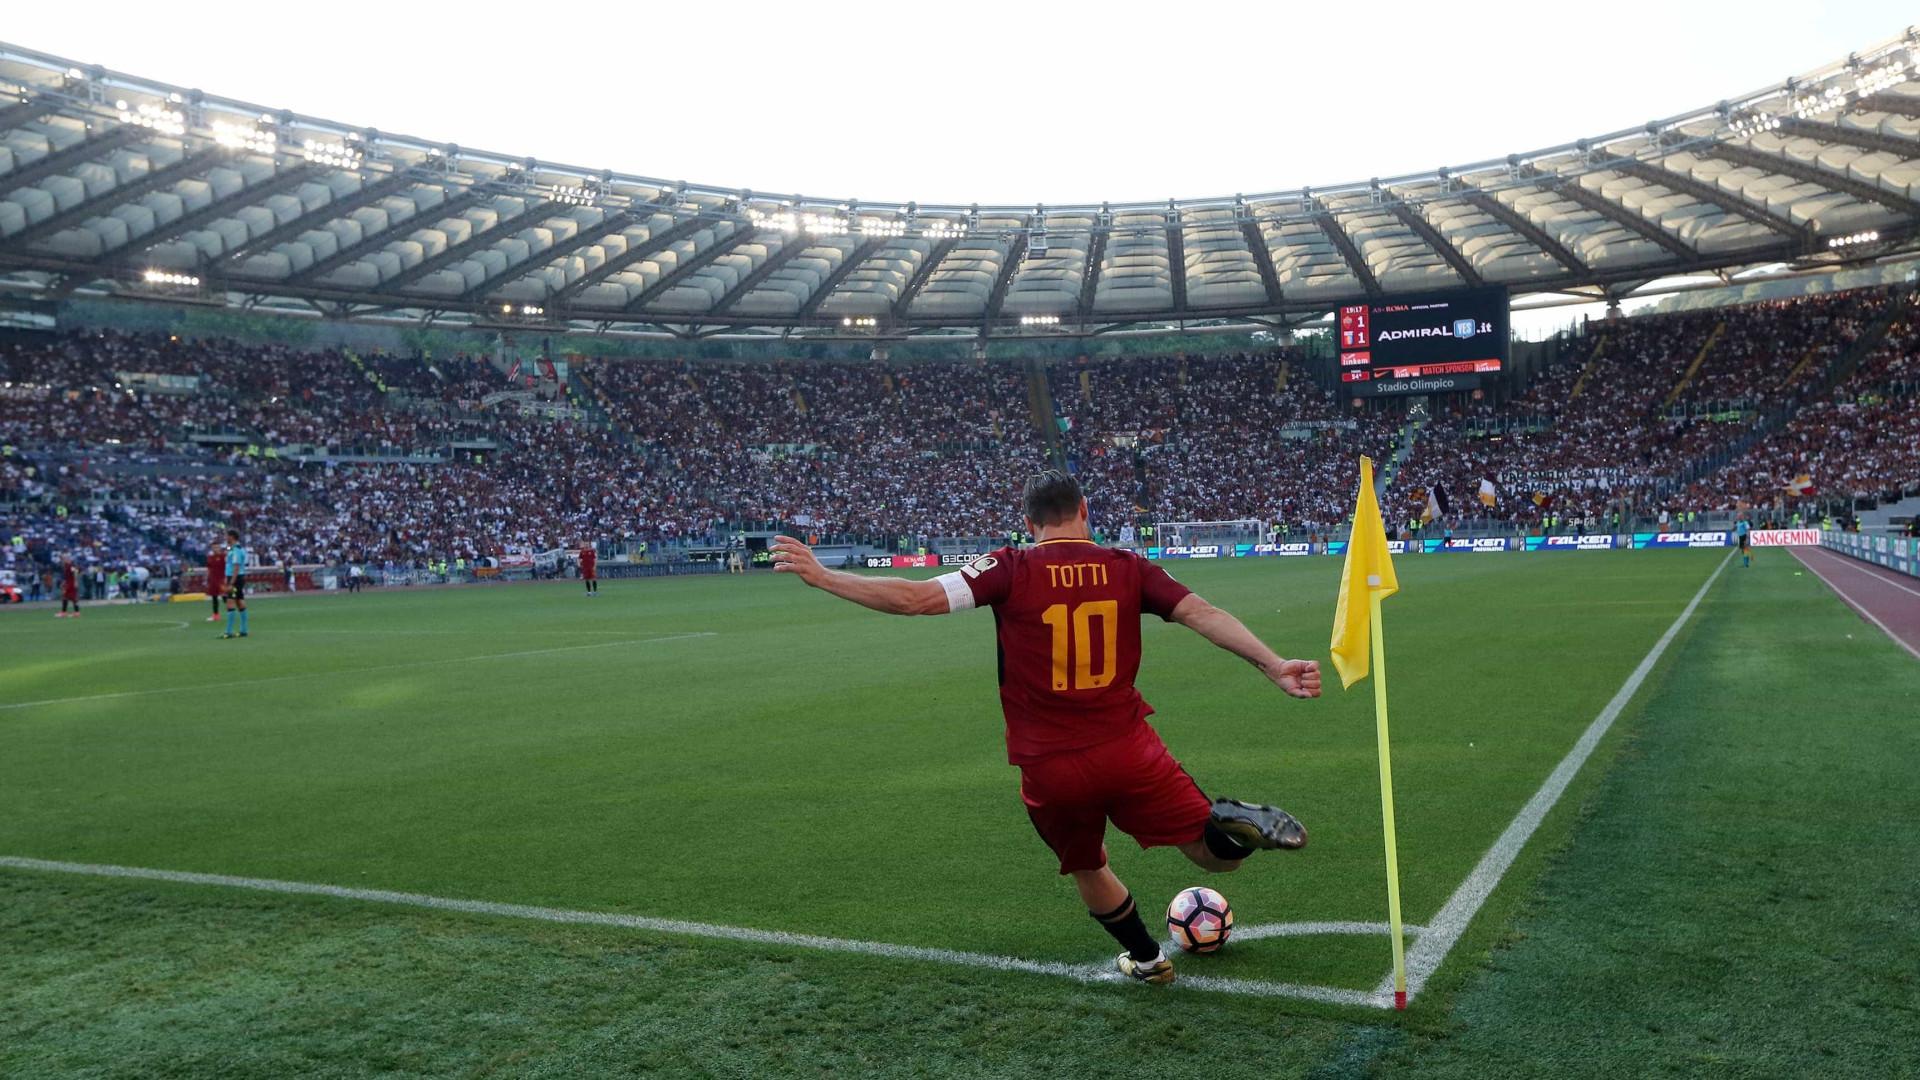 Roma garante o vice do Italiano em despedida emocionante de Totti